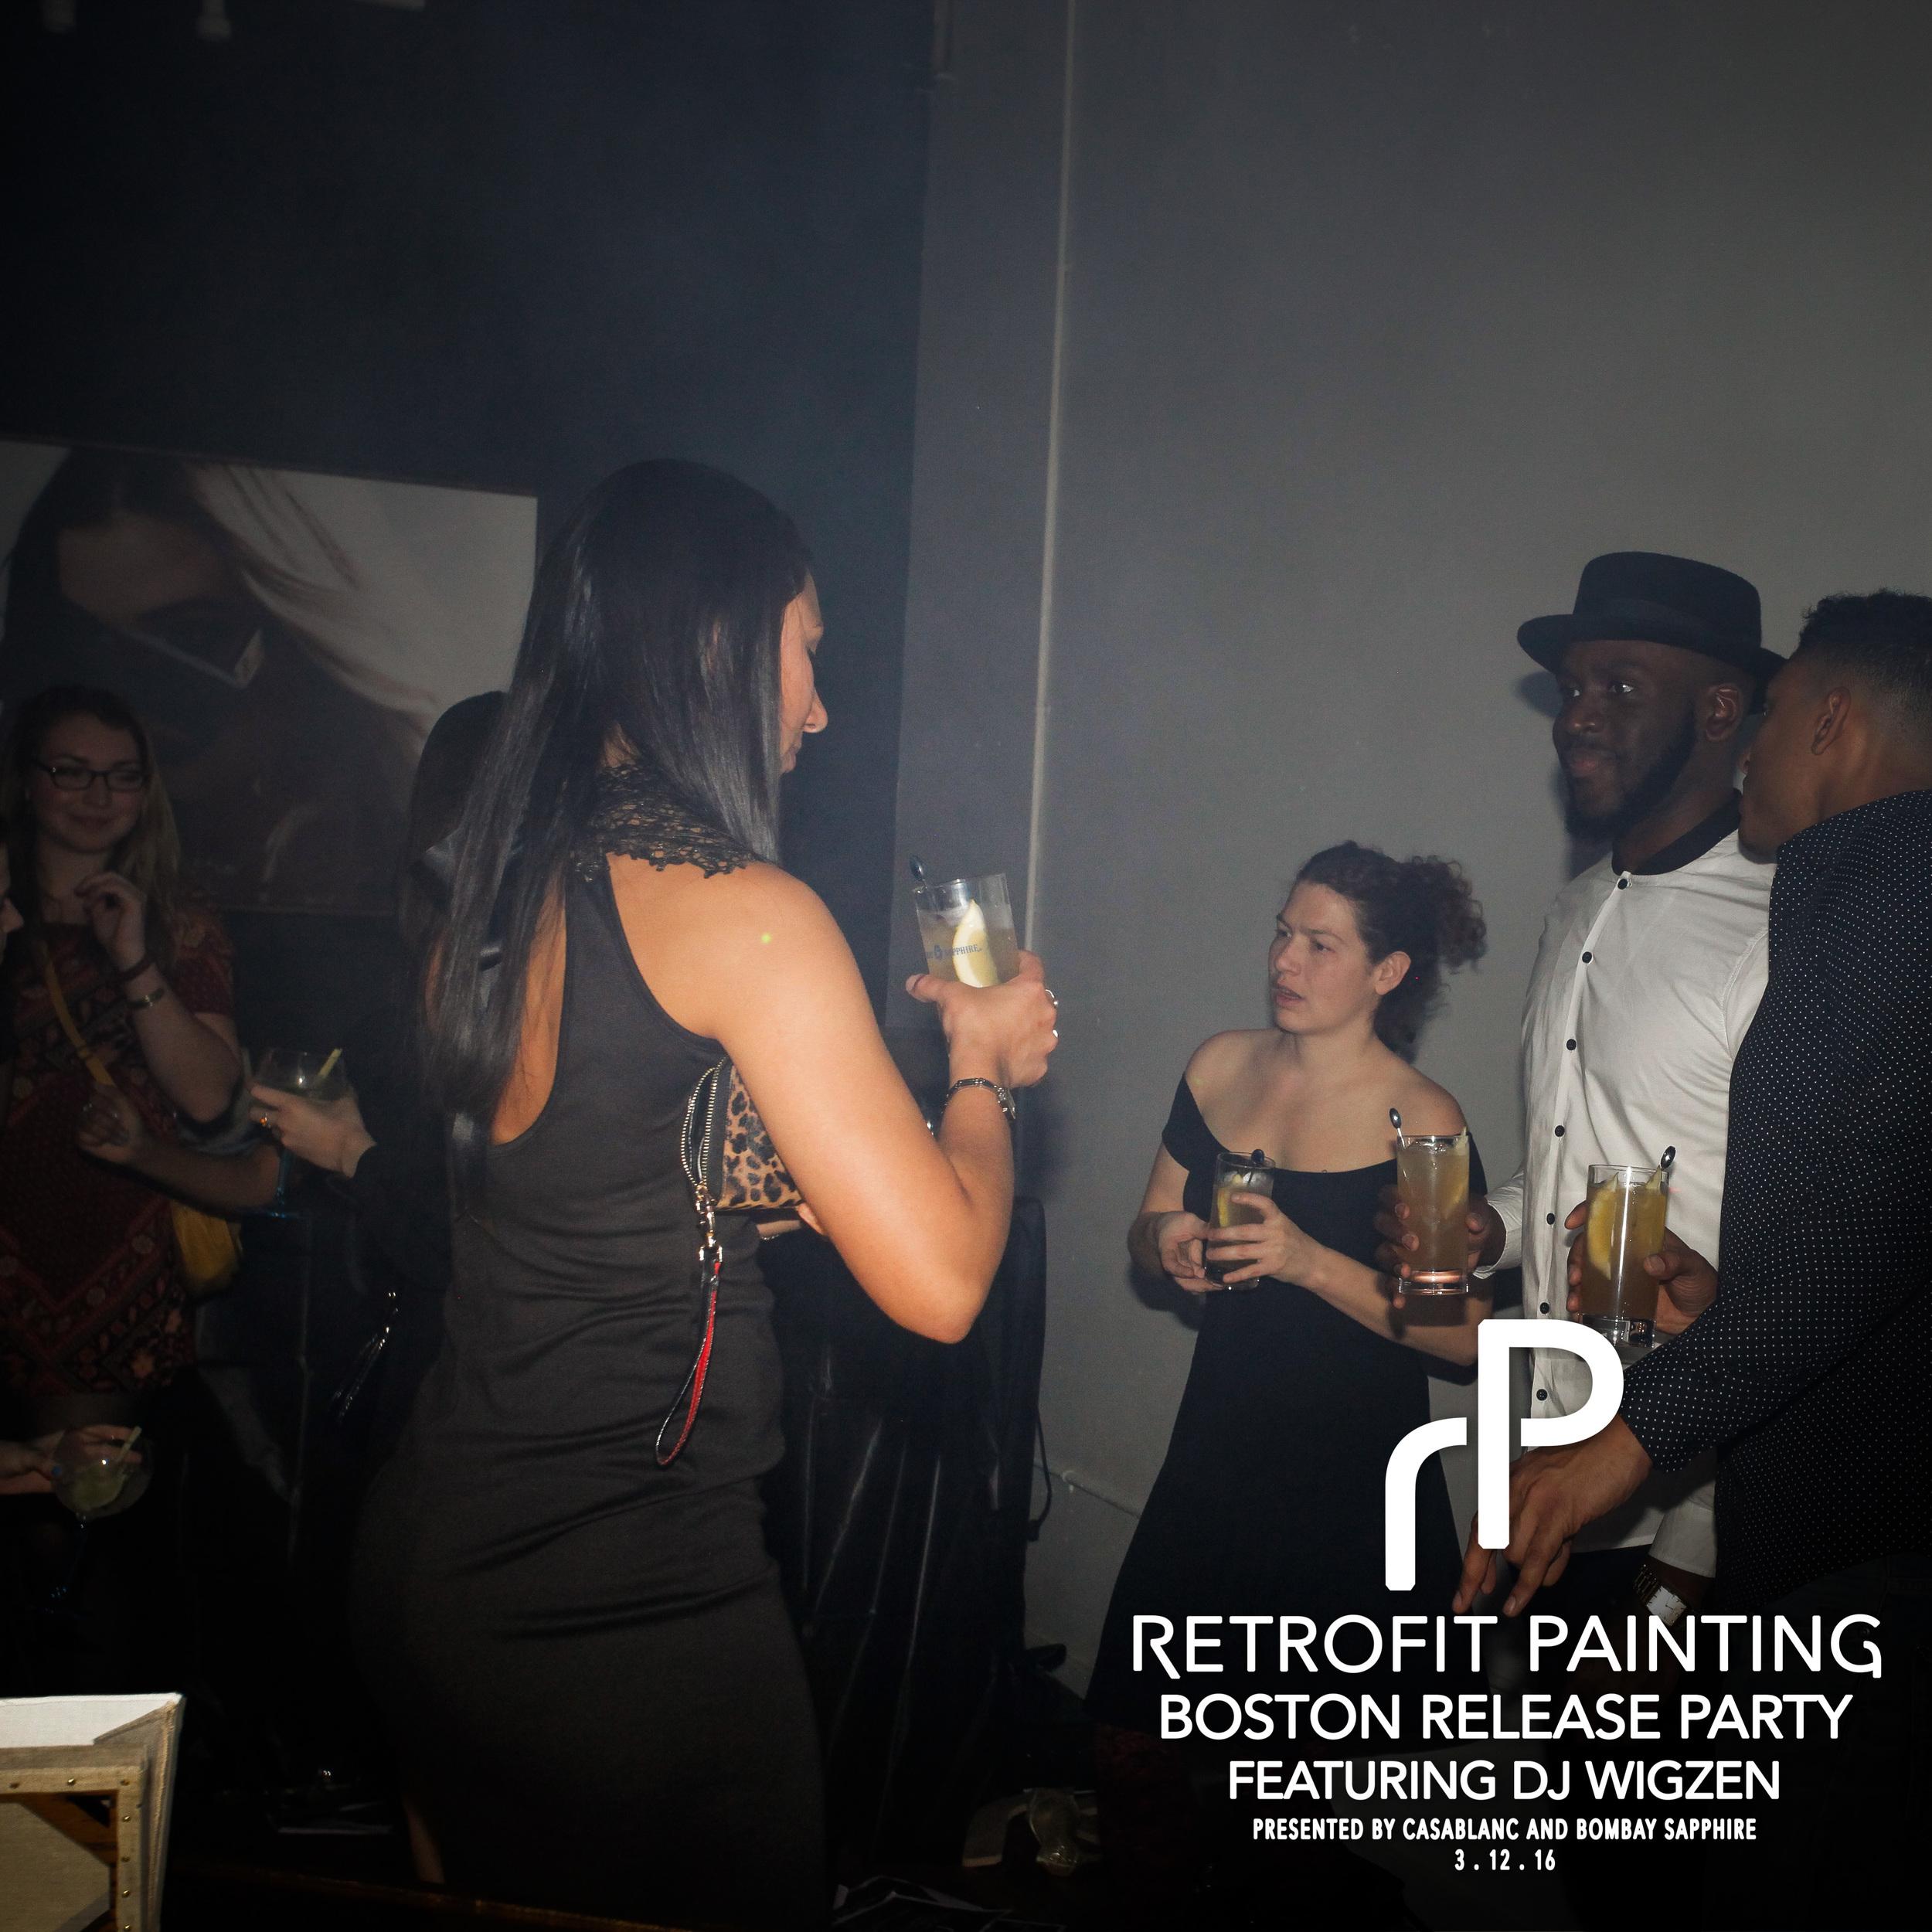 Retrofit Painting Boston Release Party 0149.jpg